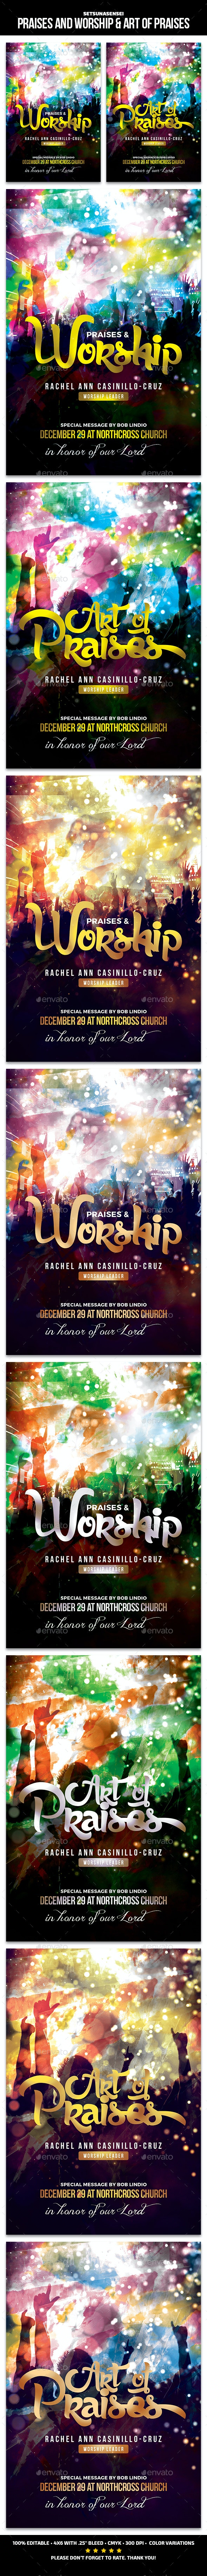 Praises and Worship & Art of Praises Church Flyer - Church Flyers